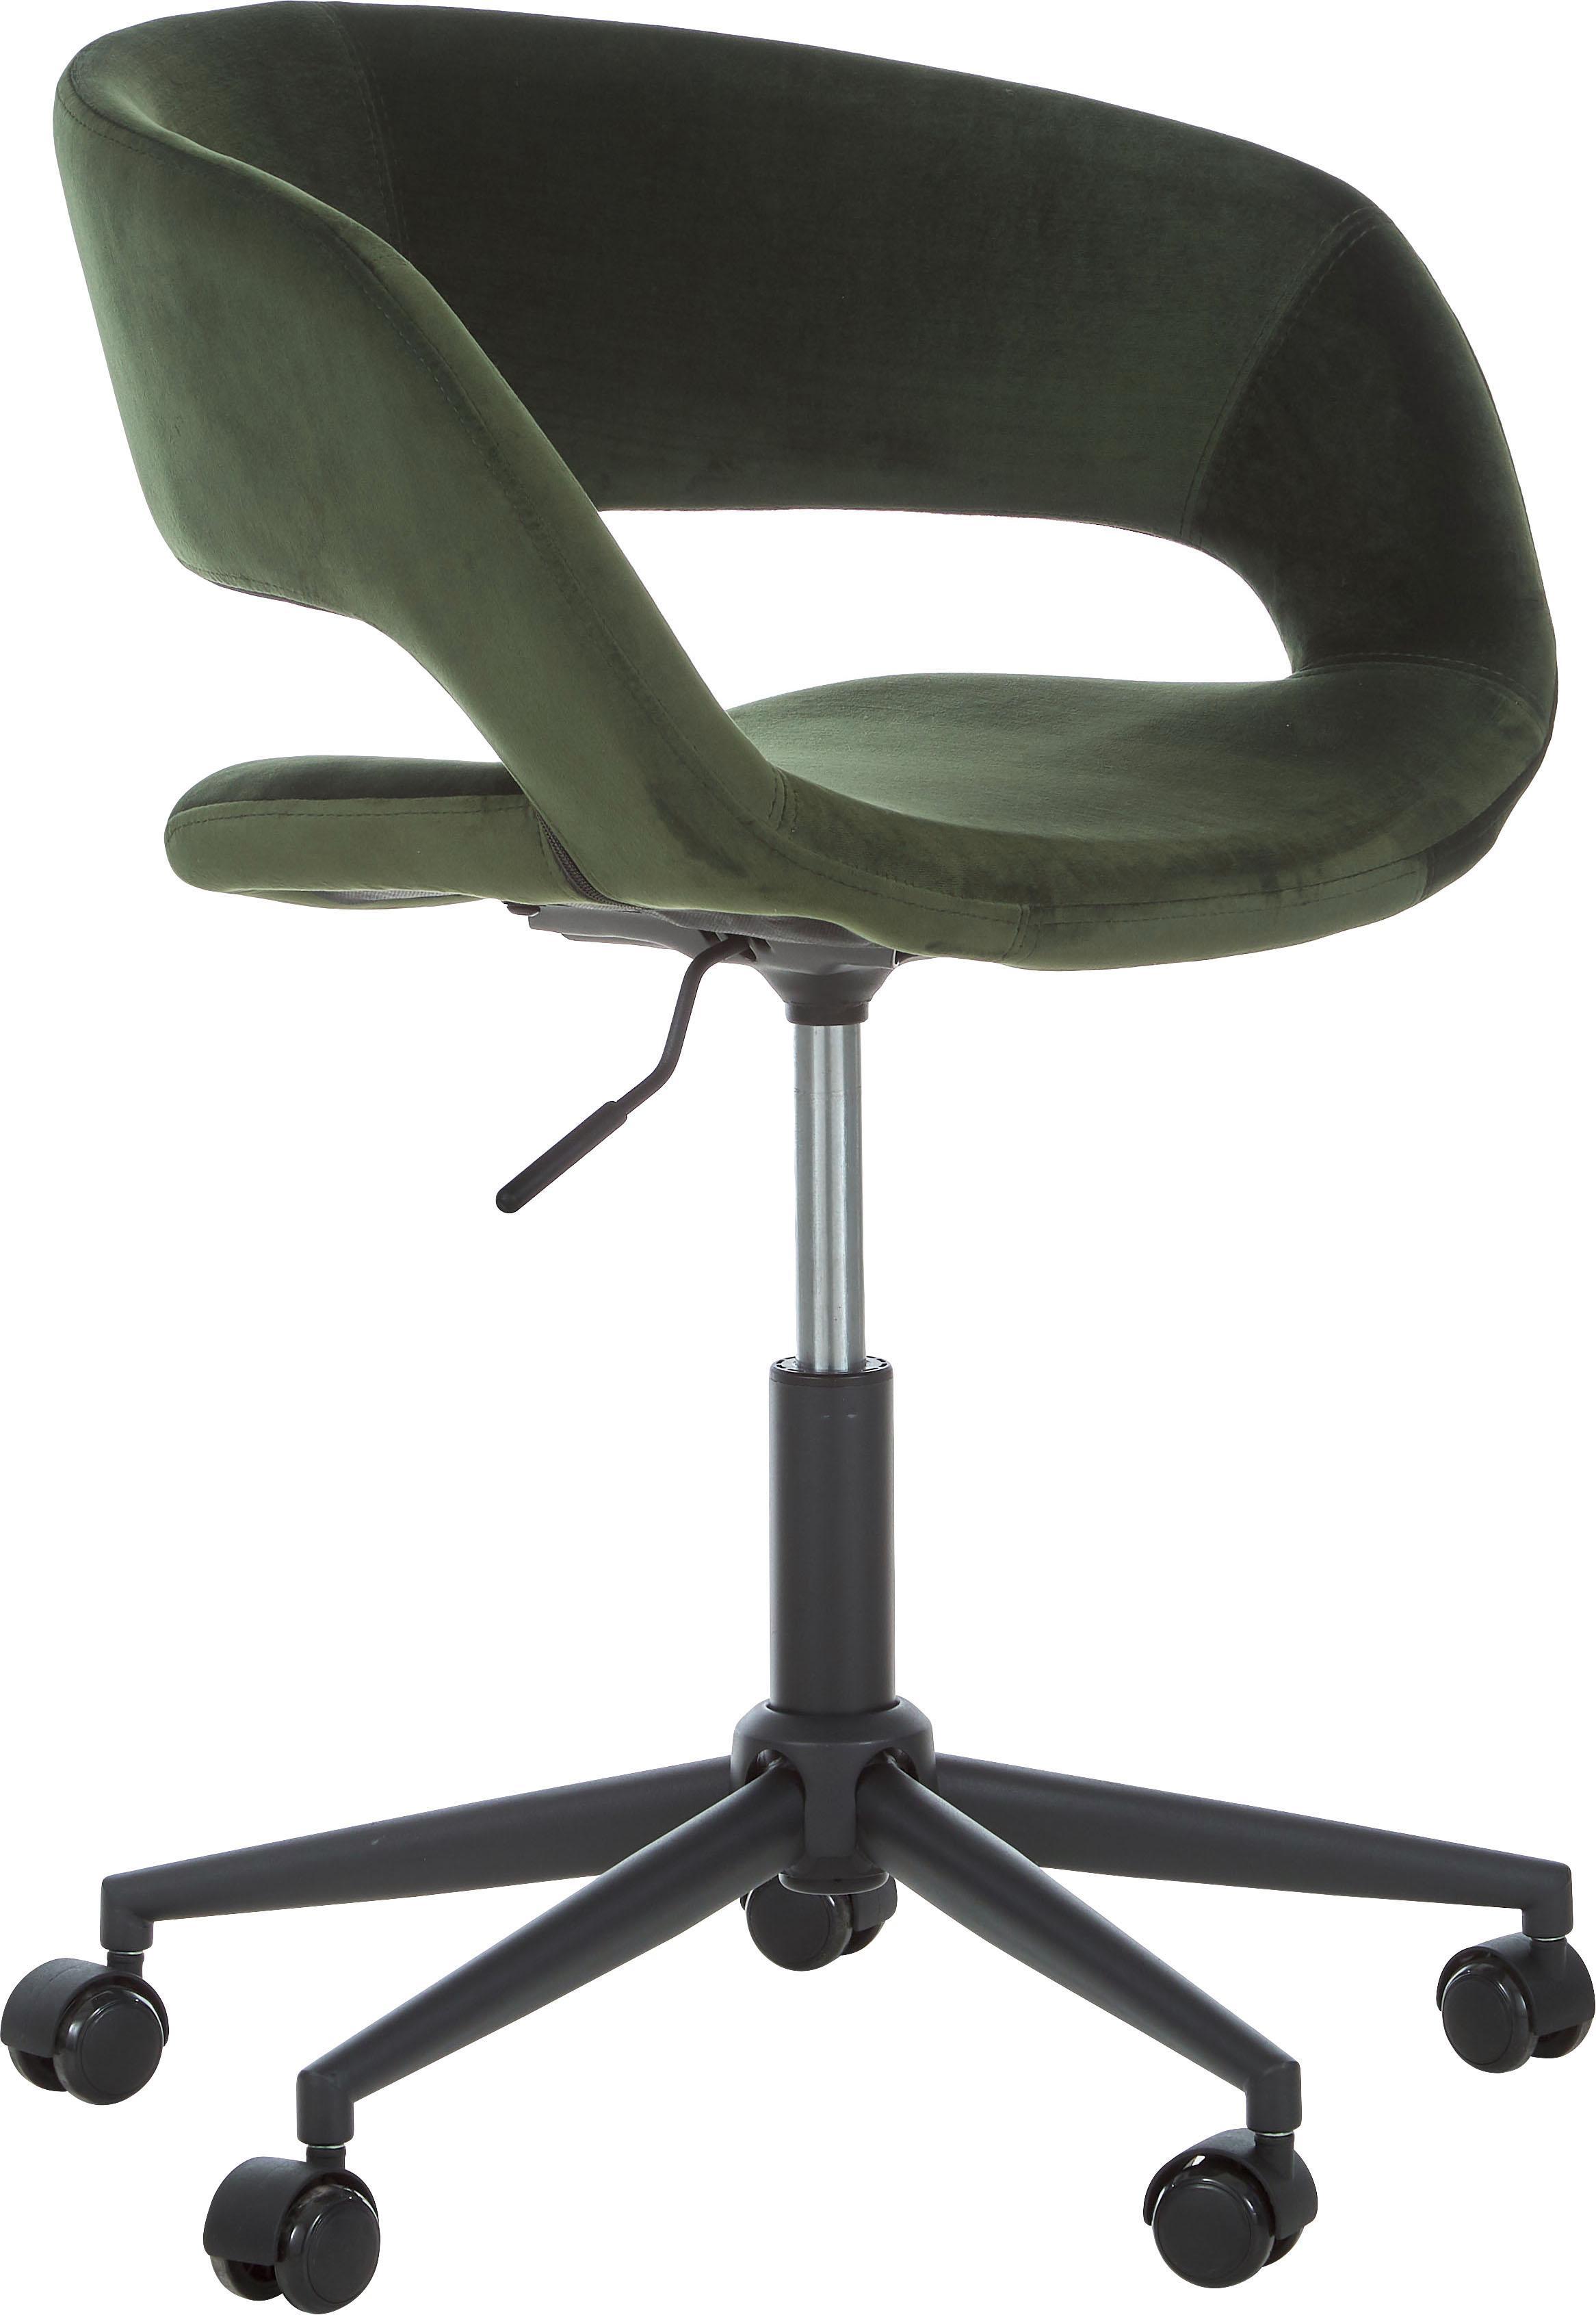 Samt-Bürodrehstuhl Grace, höhenverstellbar, Bezug: Polyestersamt 25.000 Sche, Gestell: Metall, pulverbeschichtet, Samt Waldgrün, B 56 x T 54 cm